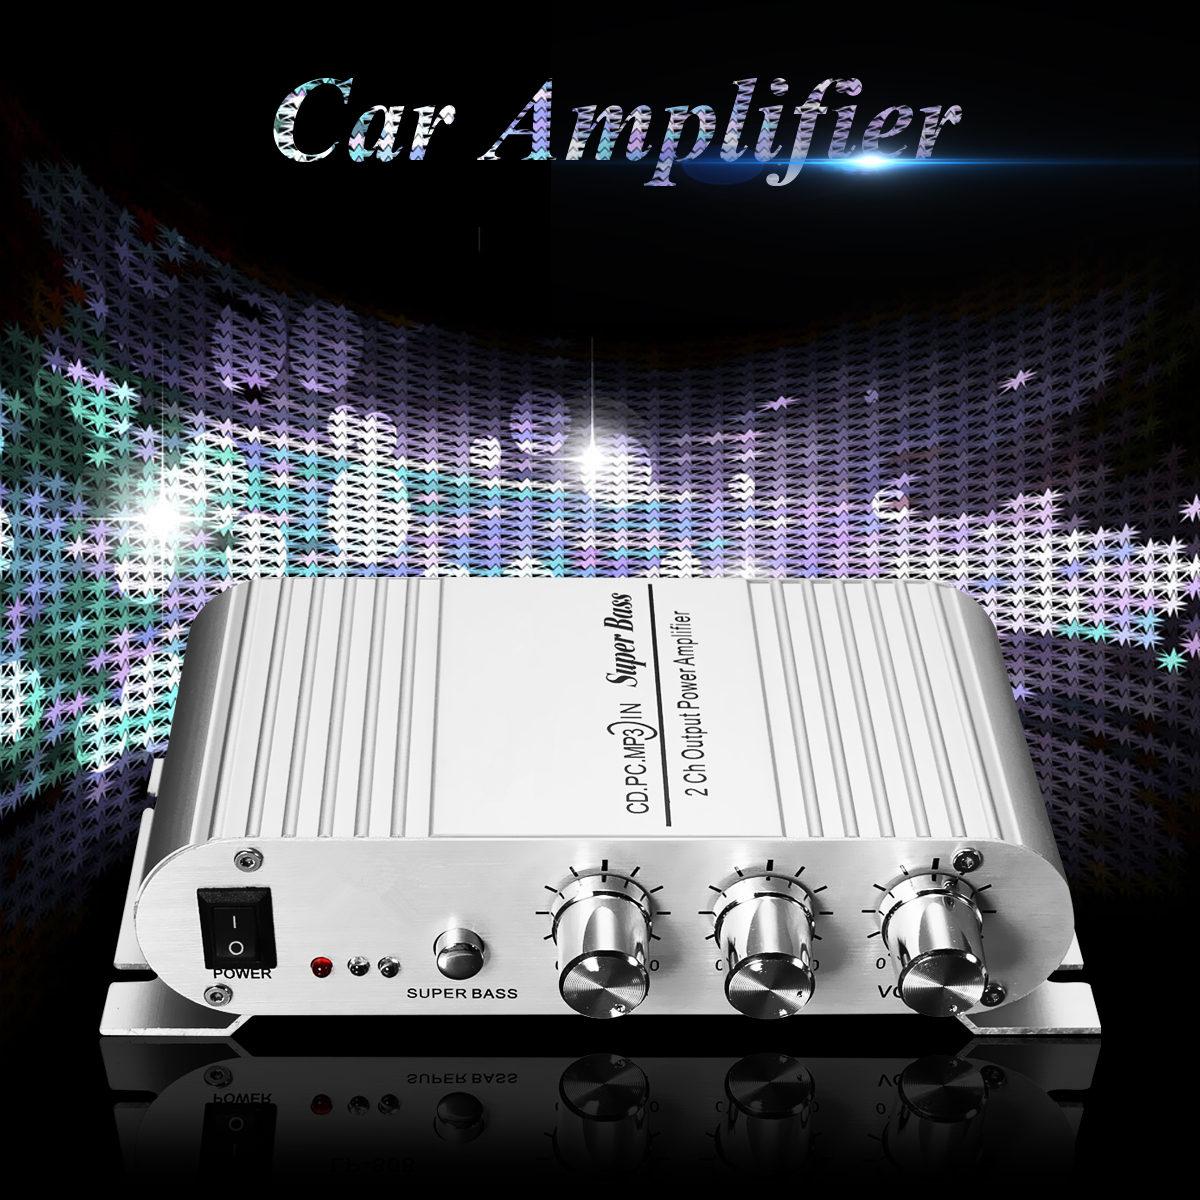 Car Amplifier 12V Mini Hi-Fi 2.1 Car Amplifier MP3 MP4 Stereo Player Audio Auto Sound Amplifier Subwoofer For mp3 PC DVD CD